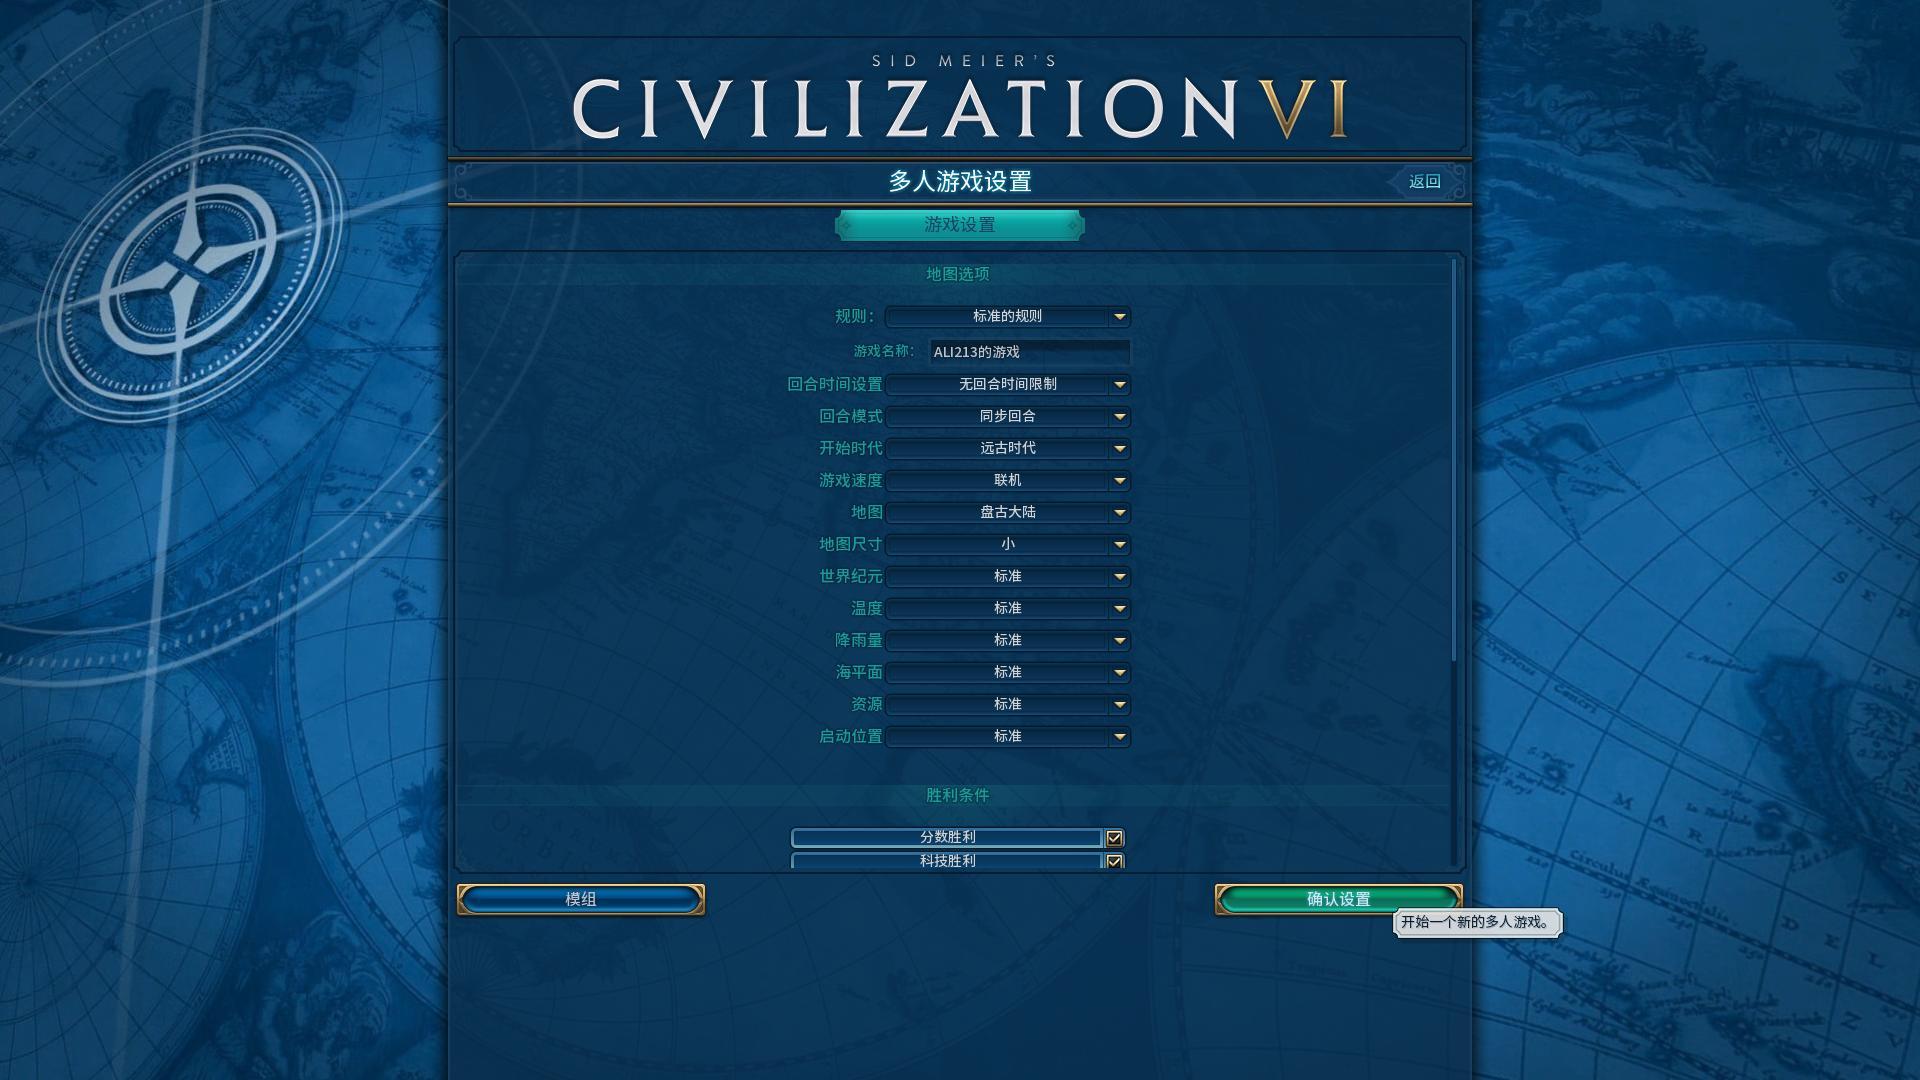 CivilizationVI 2016-10-21 15-06-50-05.jpg